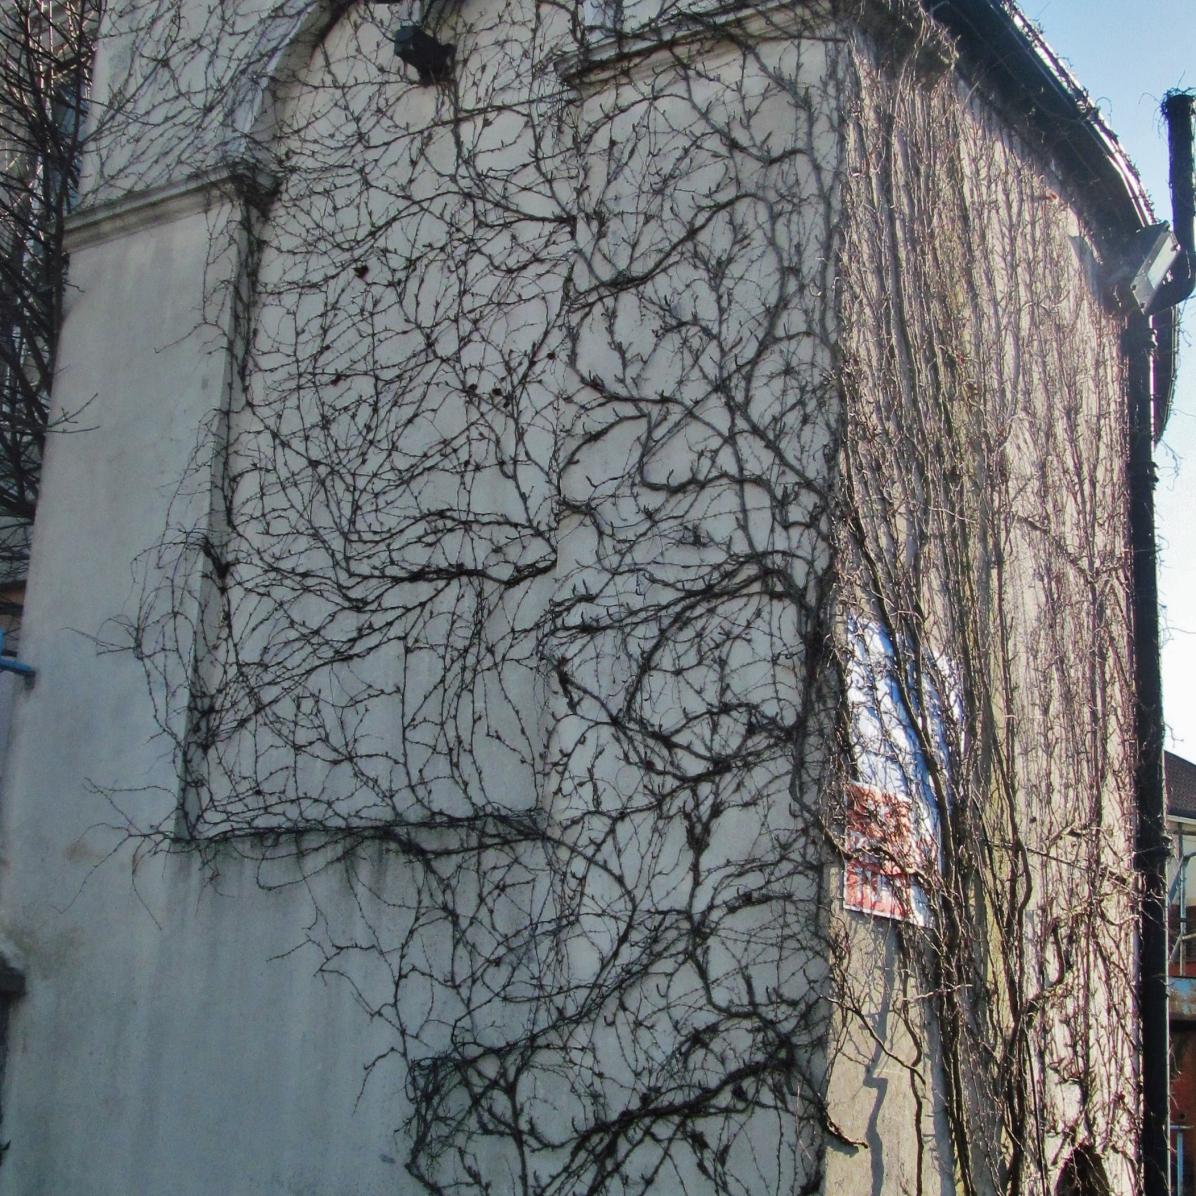 Abandoned Aldborough House, Dublin (Ireland) - Derelict World Photography – Lainey Quinn